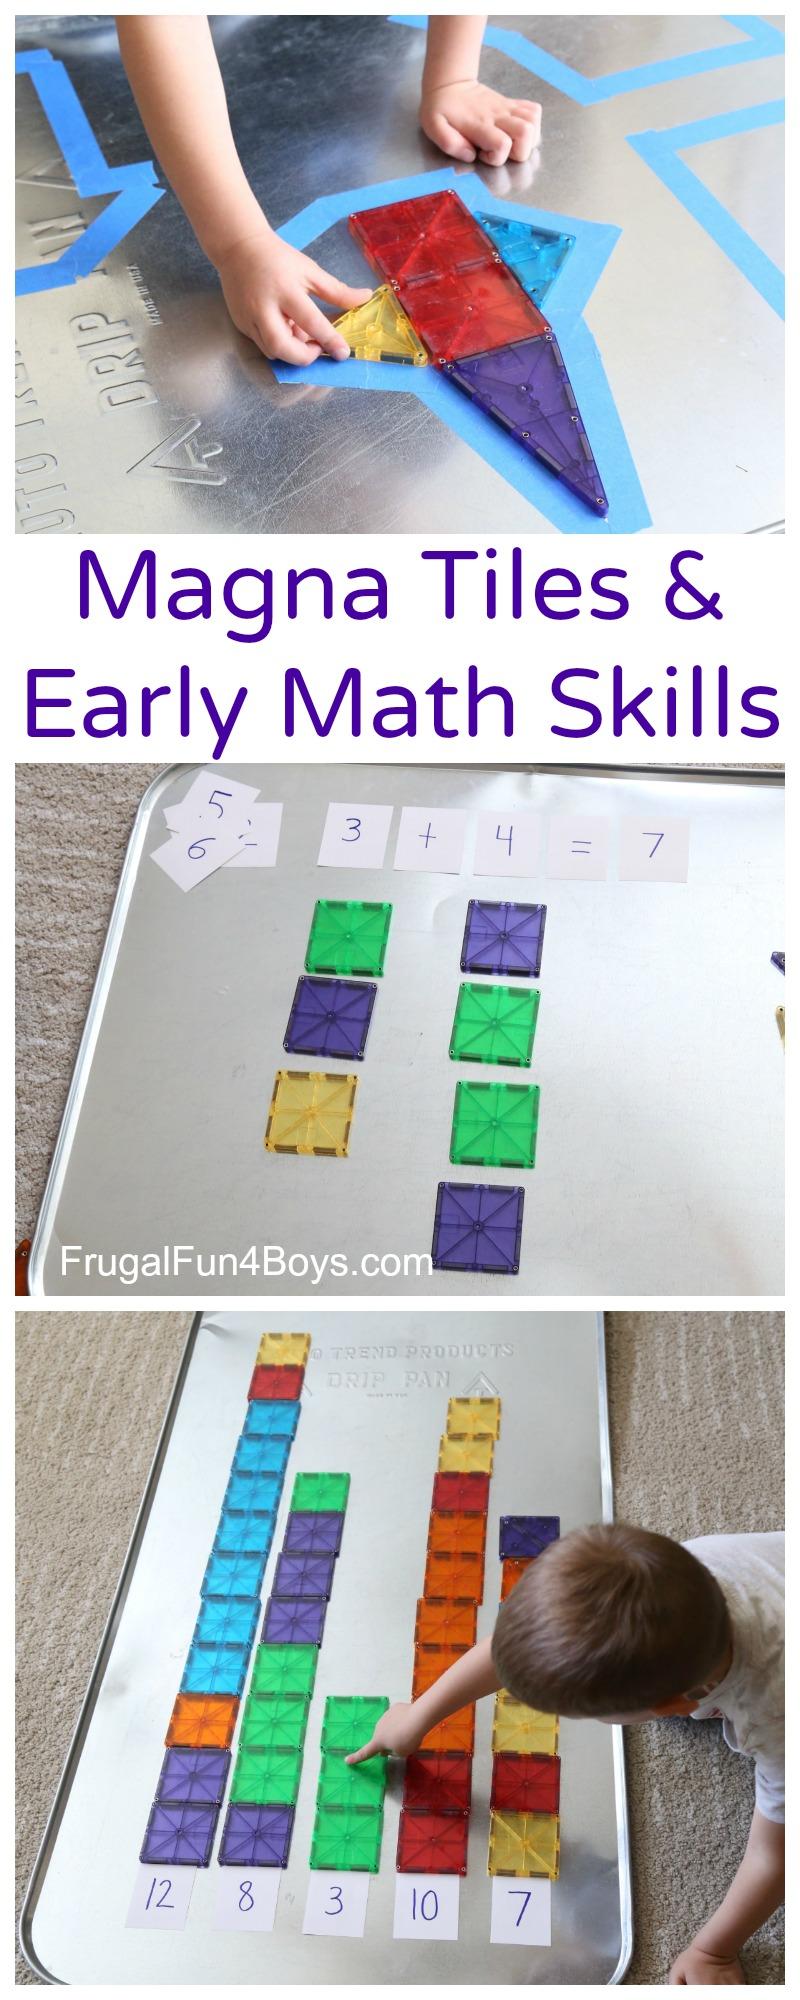 Pretentious Girls Magna Tiles Sale Magna Tiles Age Boys Magna Tiles Frugal Magna Tiles Math Activities Four Math Games baby Magna Tiles